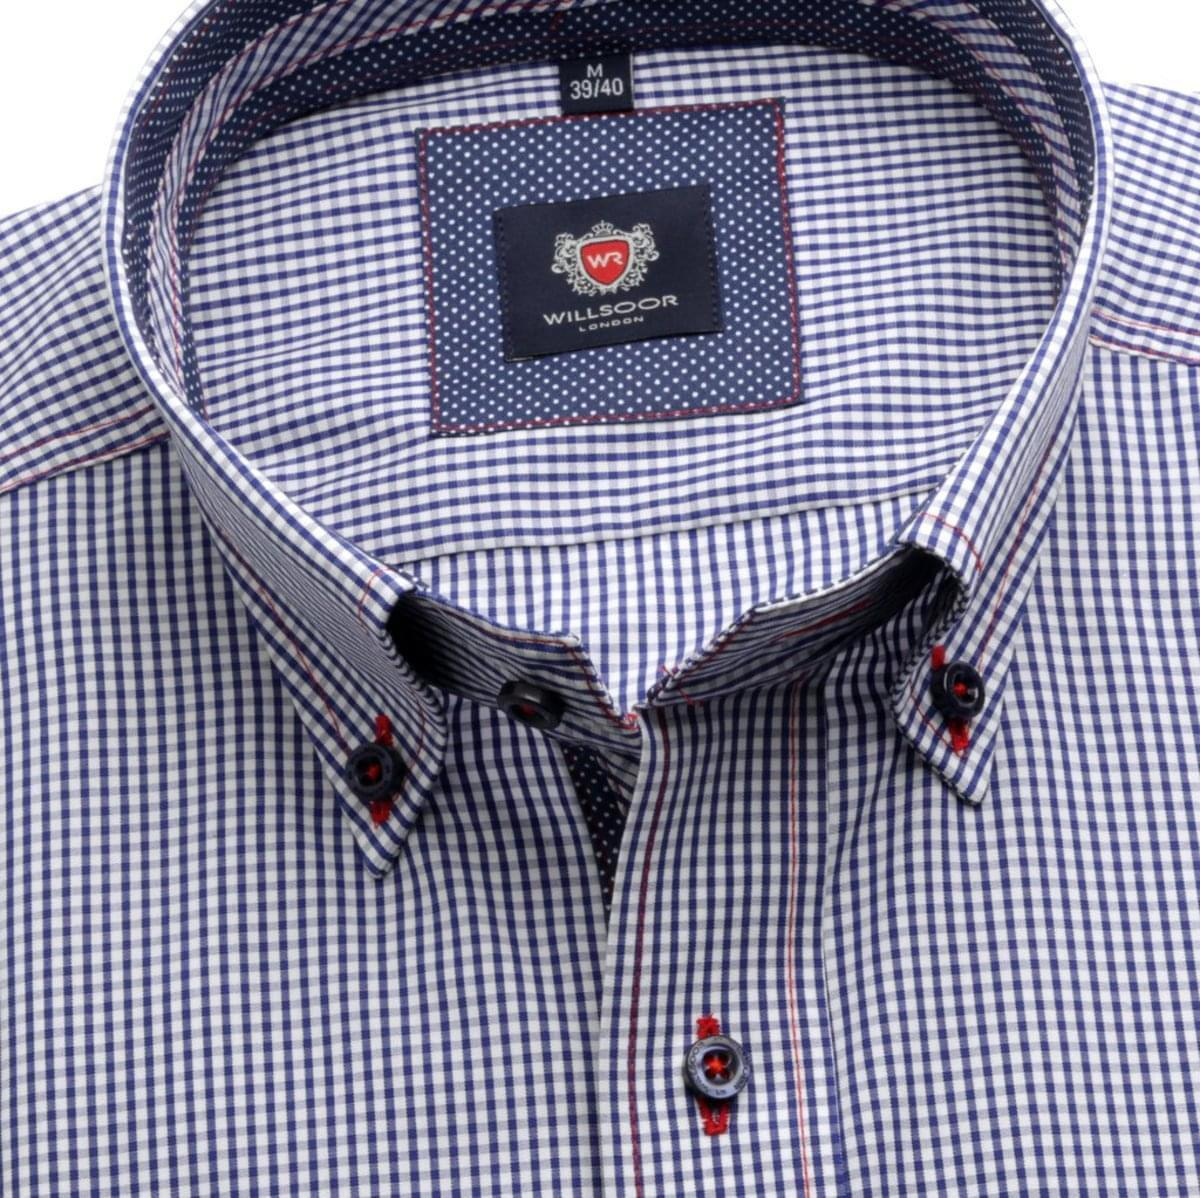 Pánská slim fit košile London (výška 176-182) 6078 s bílo-modrou kostkou a formulí Easy Care 176-182 / XL (43/44)